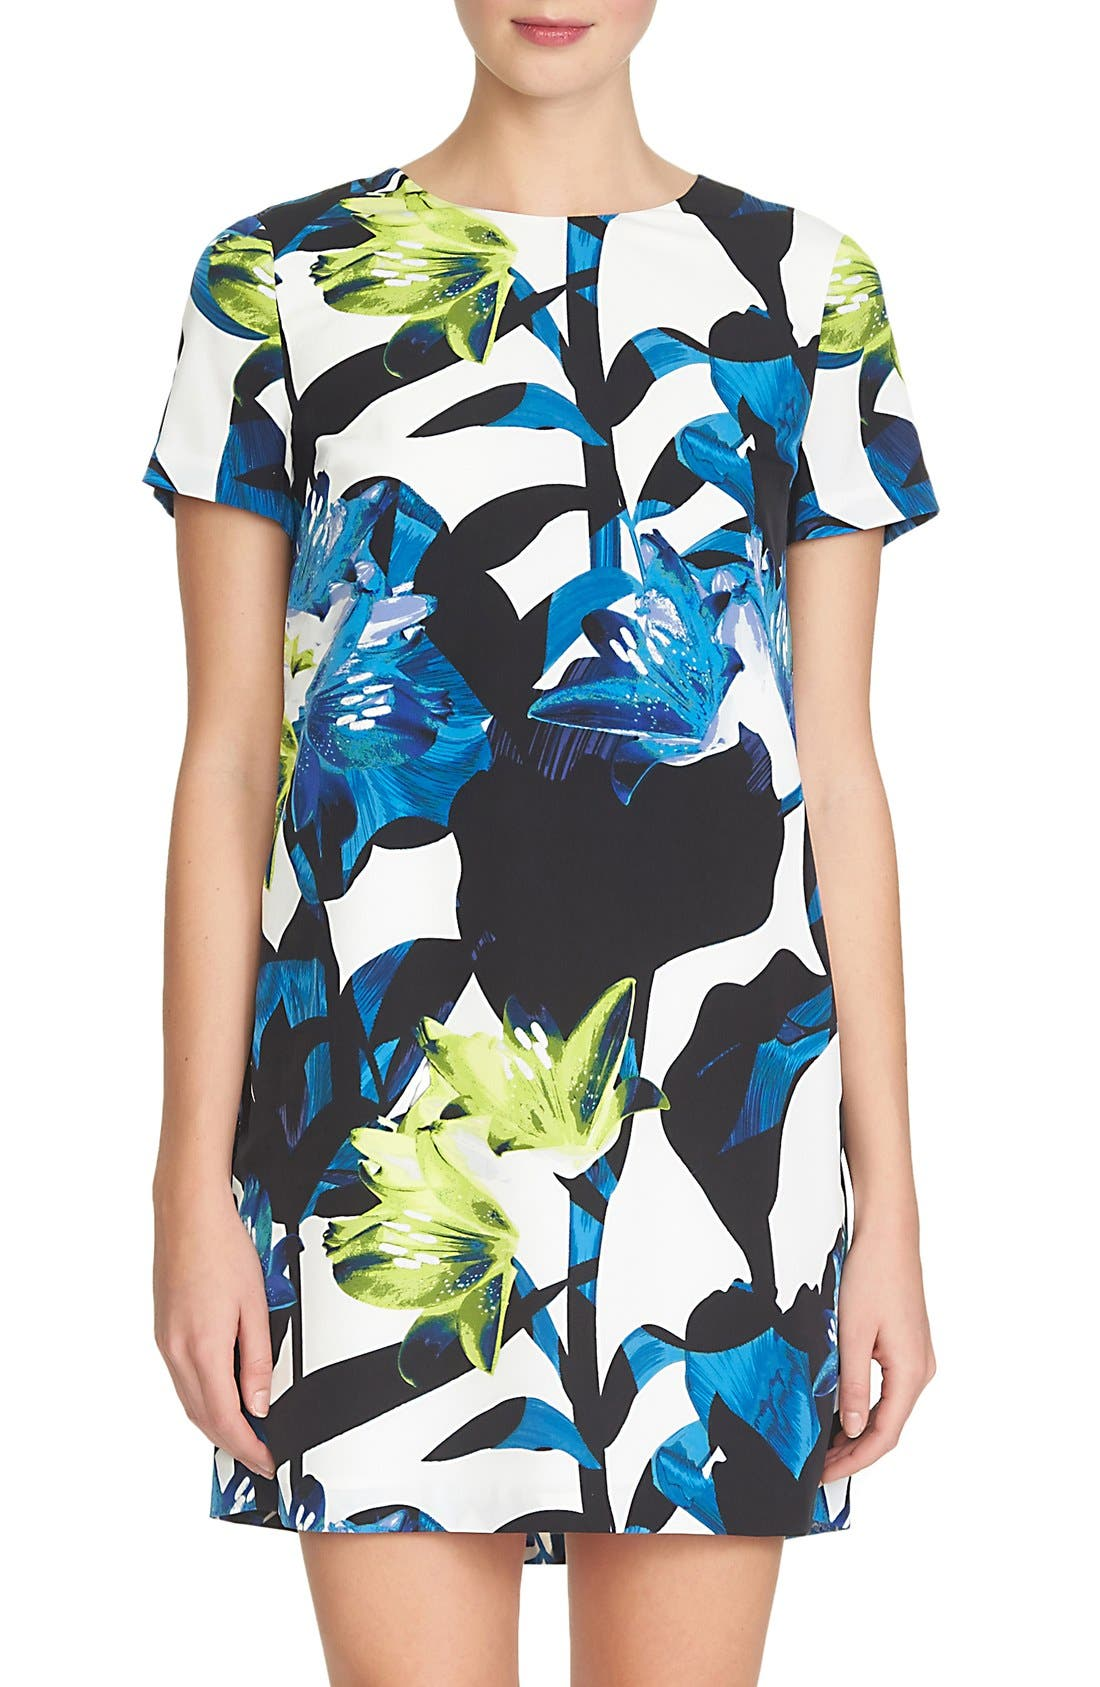 Alternate Image 1 Selected - 1.STATE Short Sleeve Shift Dress